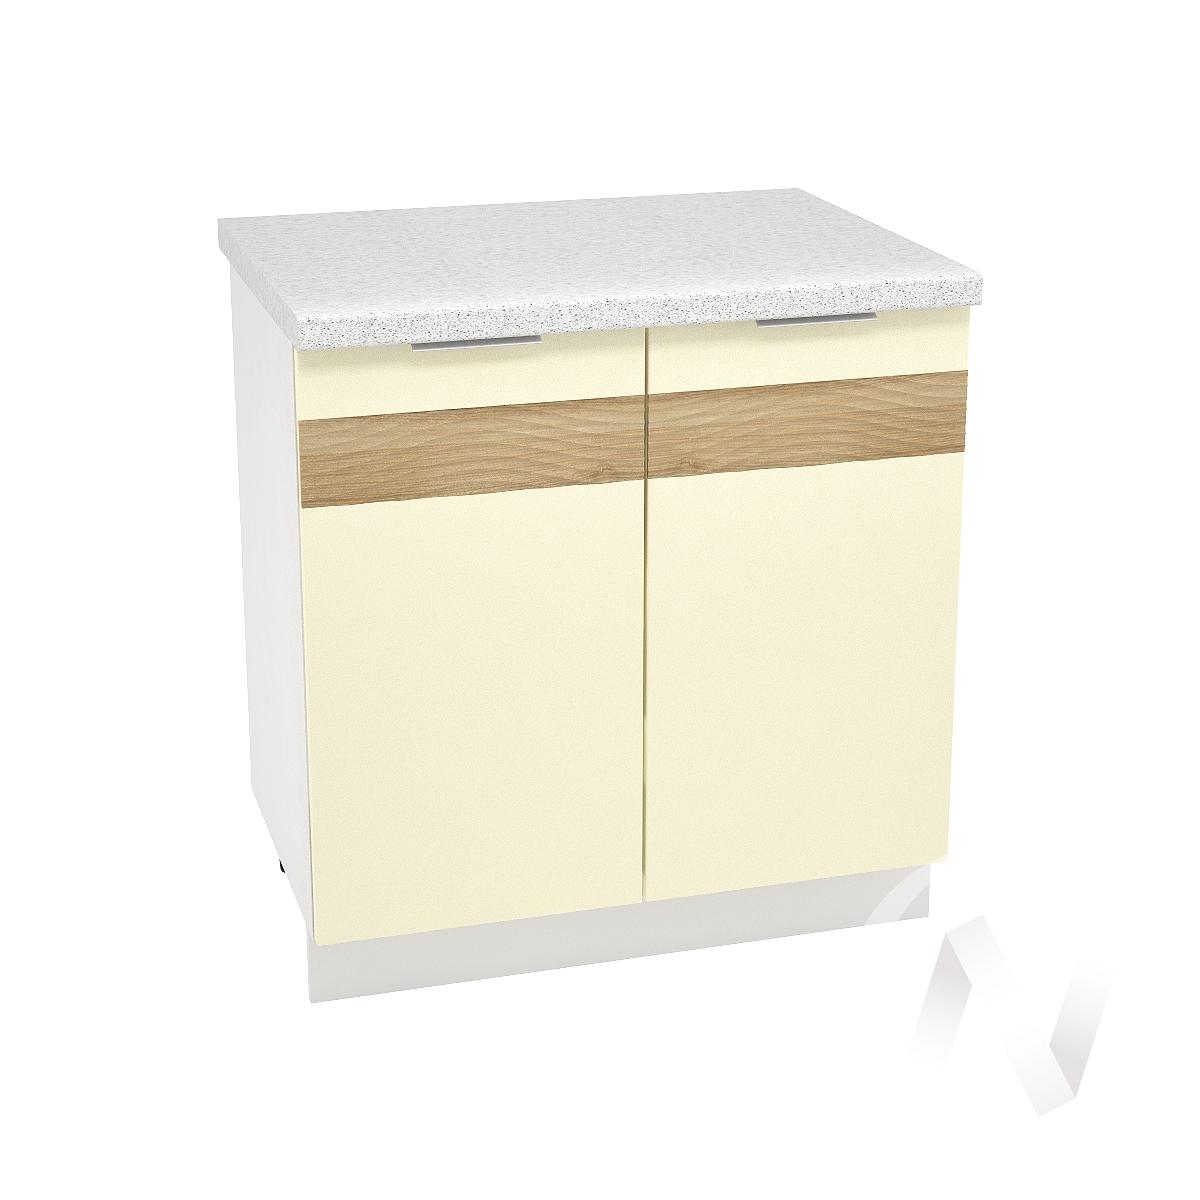 "Кухня ""Терра"": Шкаф нижний 800, ШН 800 (ваниль софт/корпус белый)"